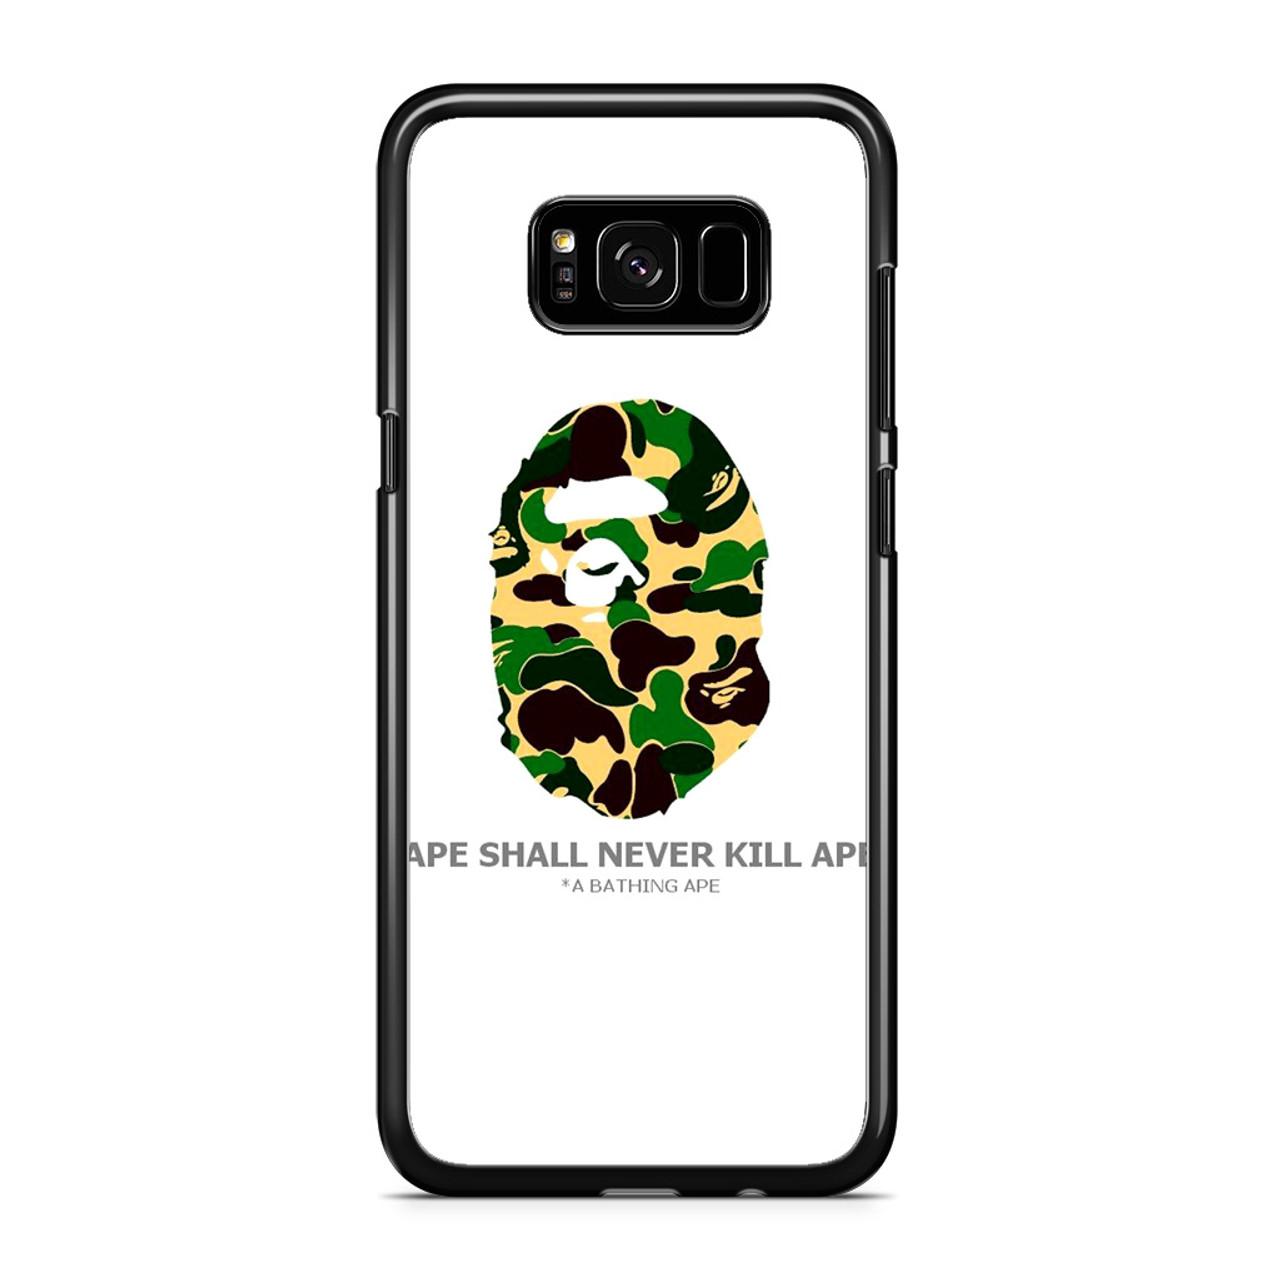 reputable site a2494 80a6e Bape Ape Camo Samsung Galaxy S8 Case